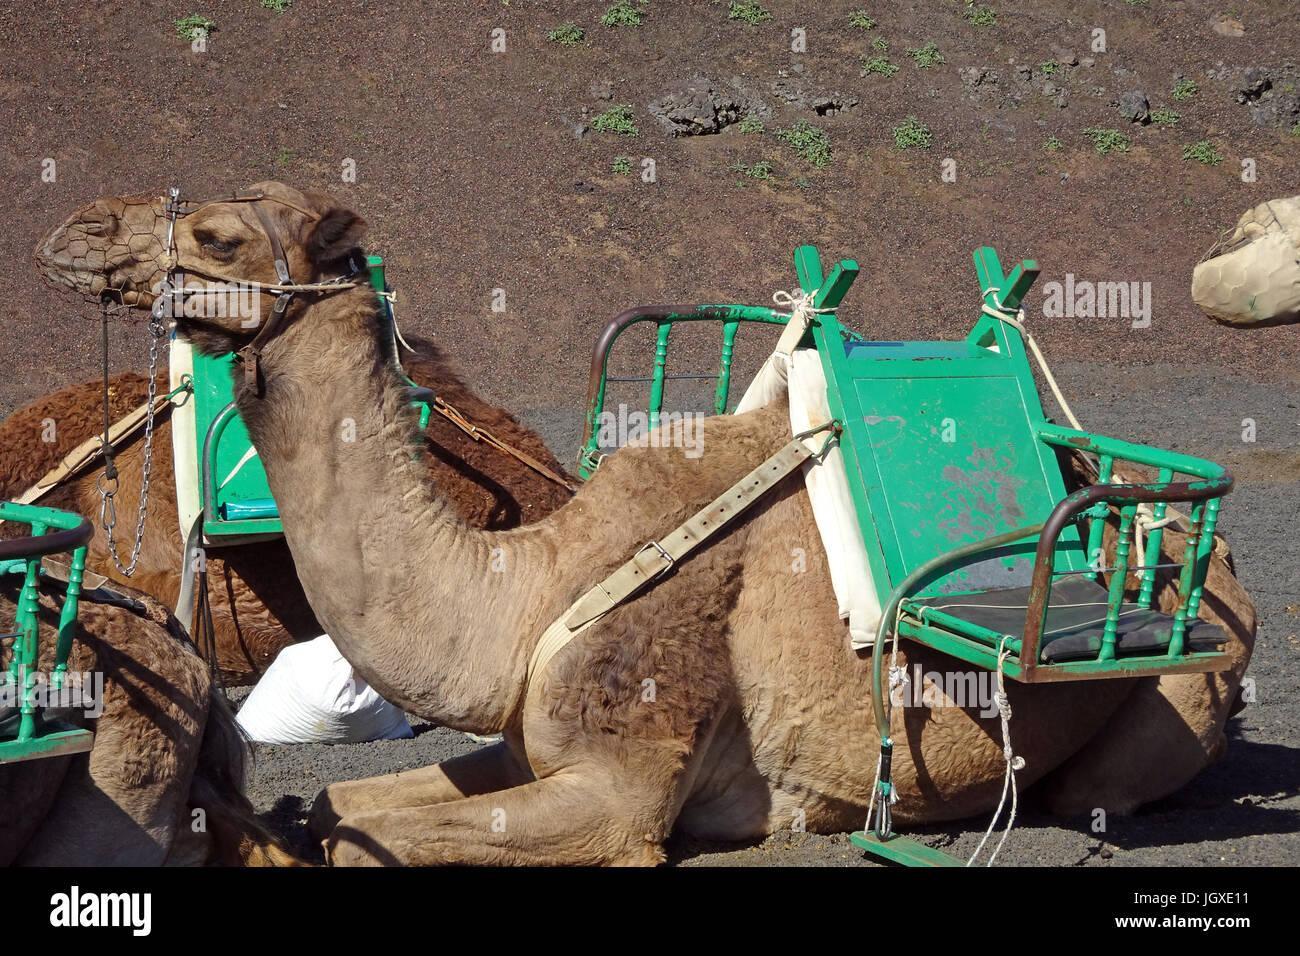 Dromedare, einhoeckriges Kamel (Camelus dromedarius), Reitkamele fuer touristische Ausfluege im Nationalpark Timanfaya, - Stock Image